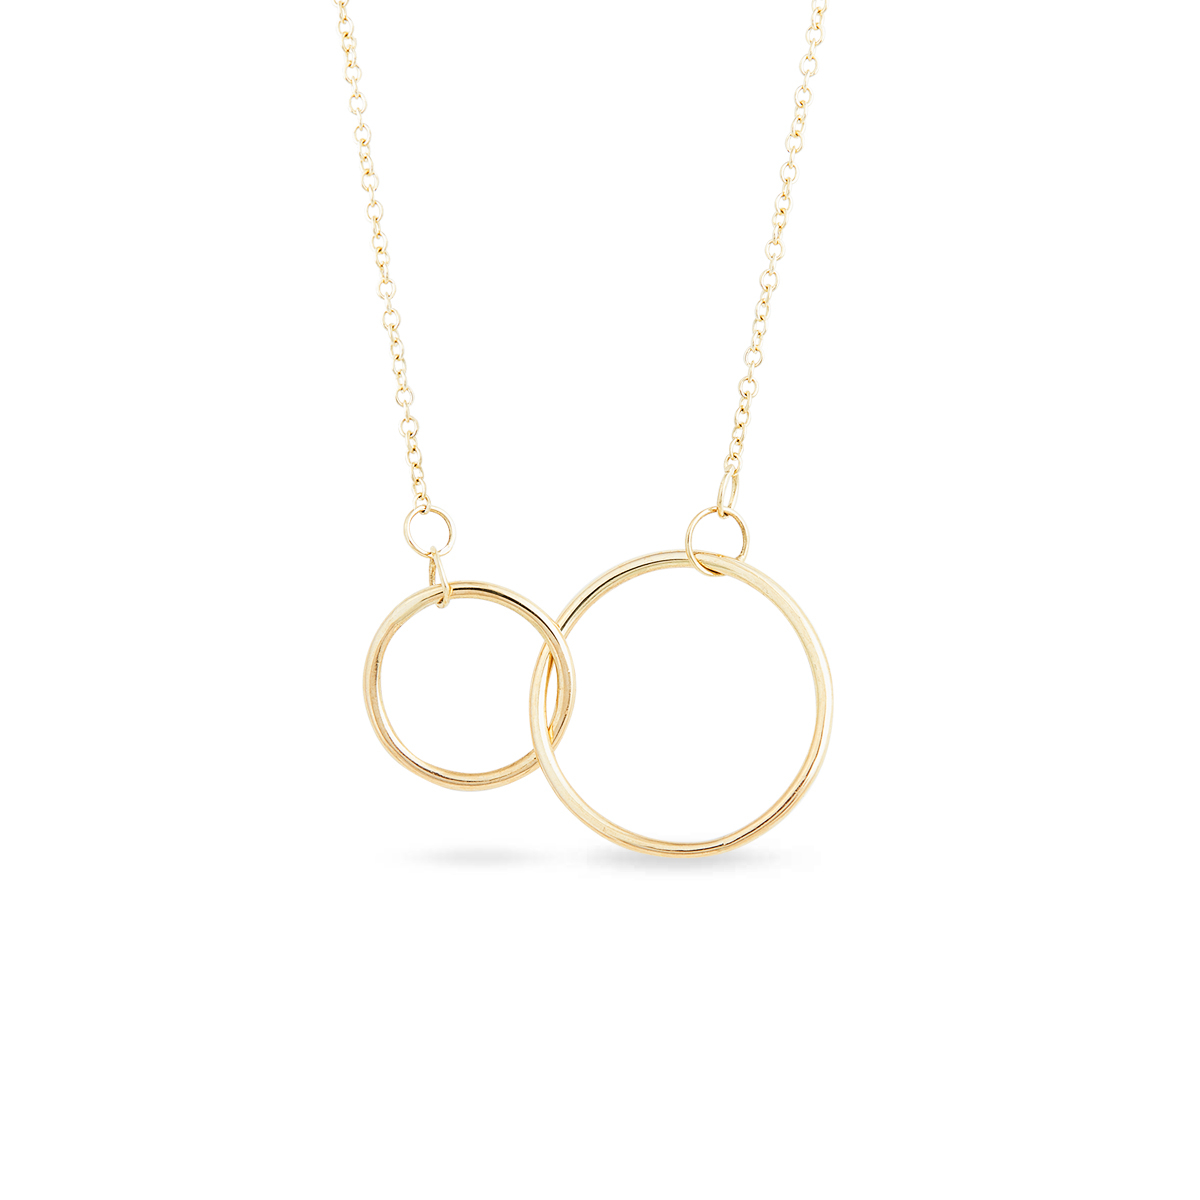 https://www.klenota.co.uk/Yellow-Gold-Pendants/Modern-gold-necklace